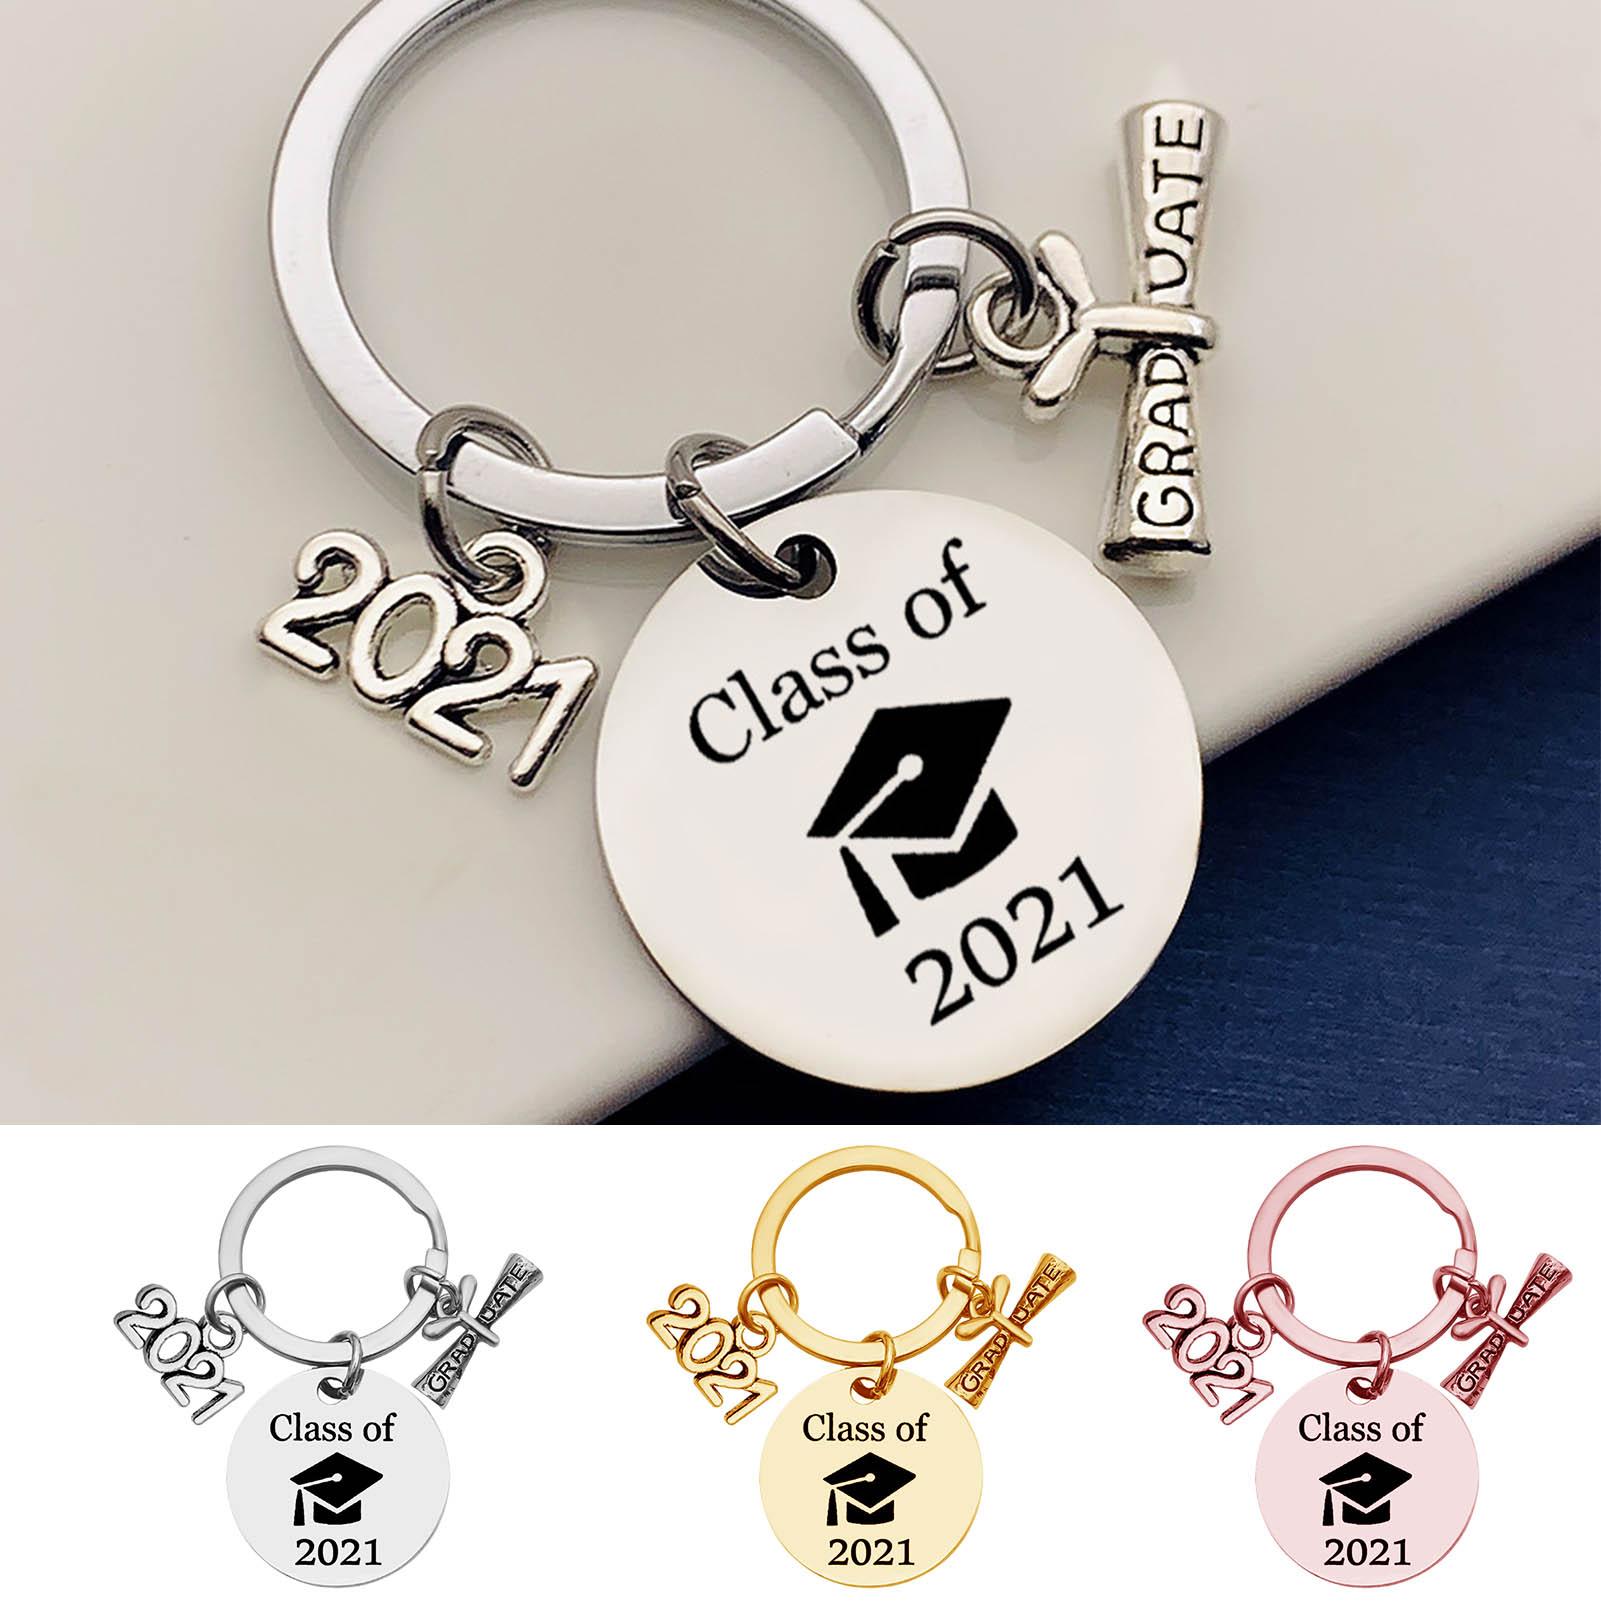 2021 Graduation Souvenir Keychain Class Stainless Steel Key Ring For High School College Graduation